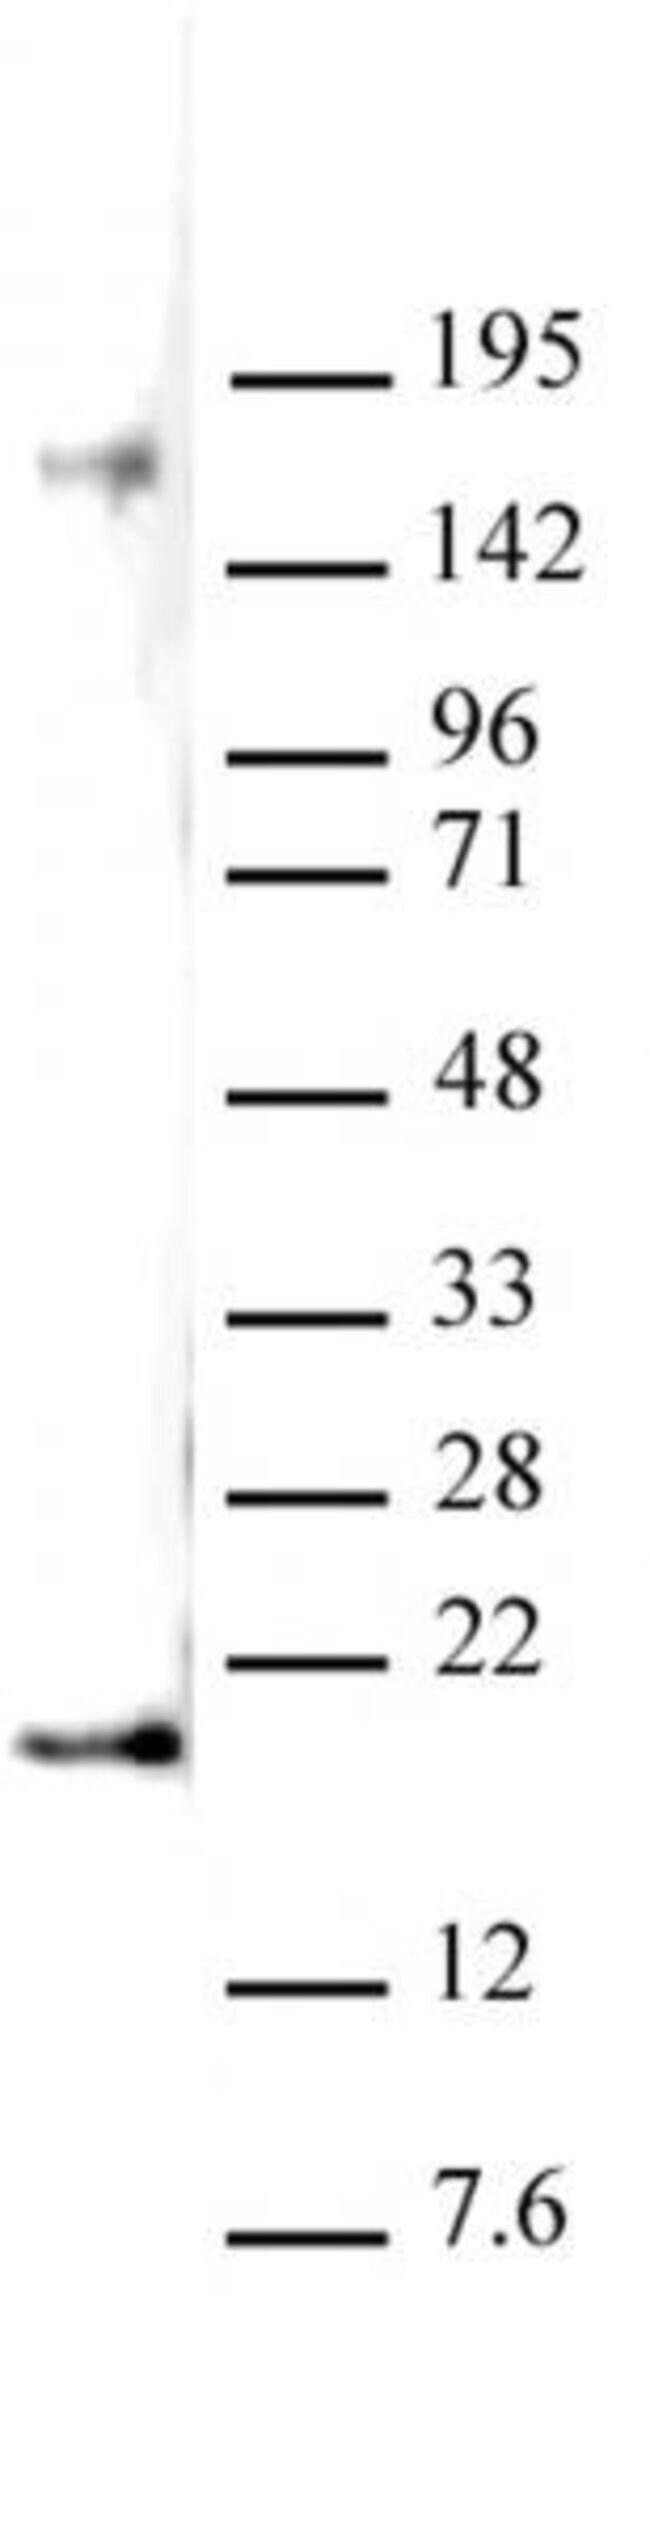 Histone H3K27me2 Rabbit anti-Human, Unconjugated, Polyclonal, Active Motif:Antibodies:Primary